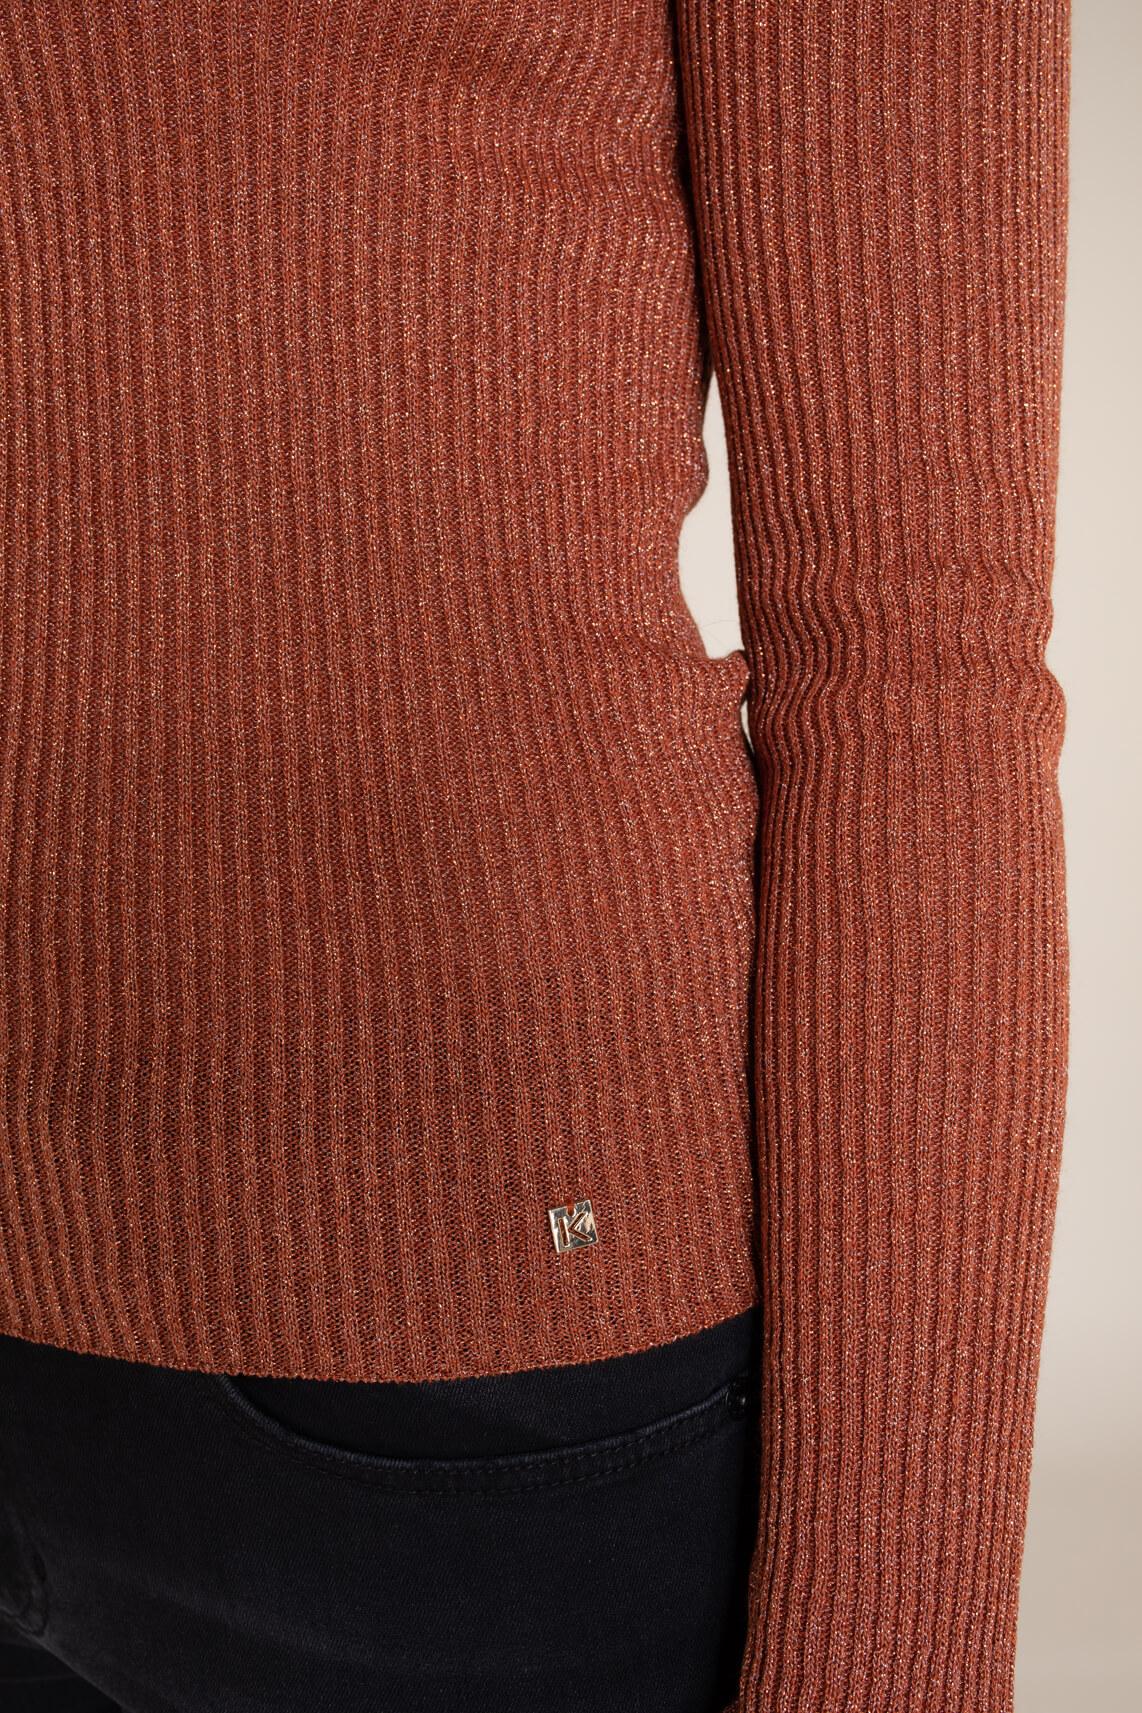 Kocca Dames Elundi pullover Bruin